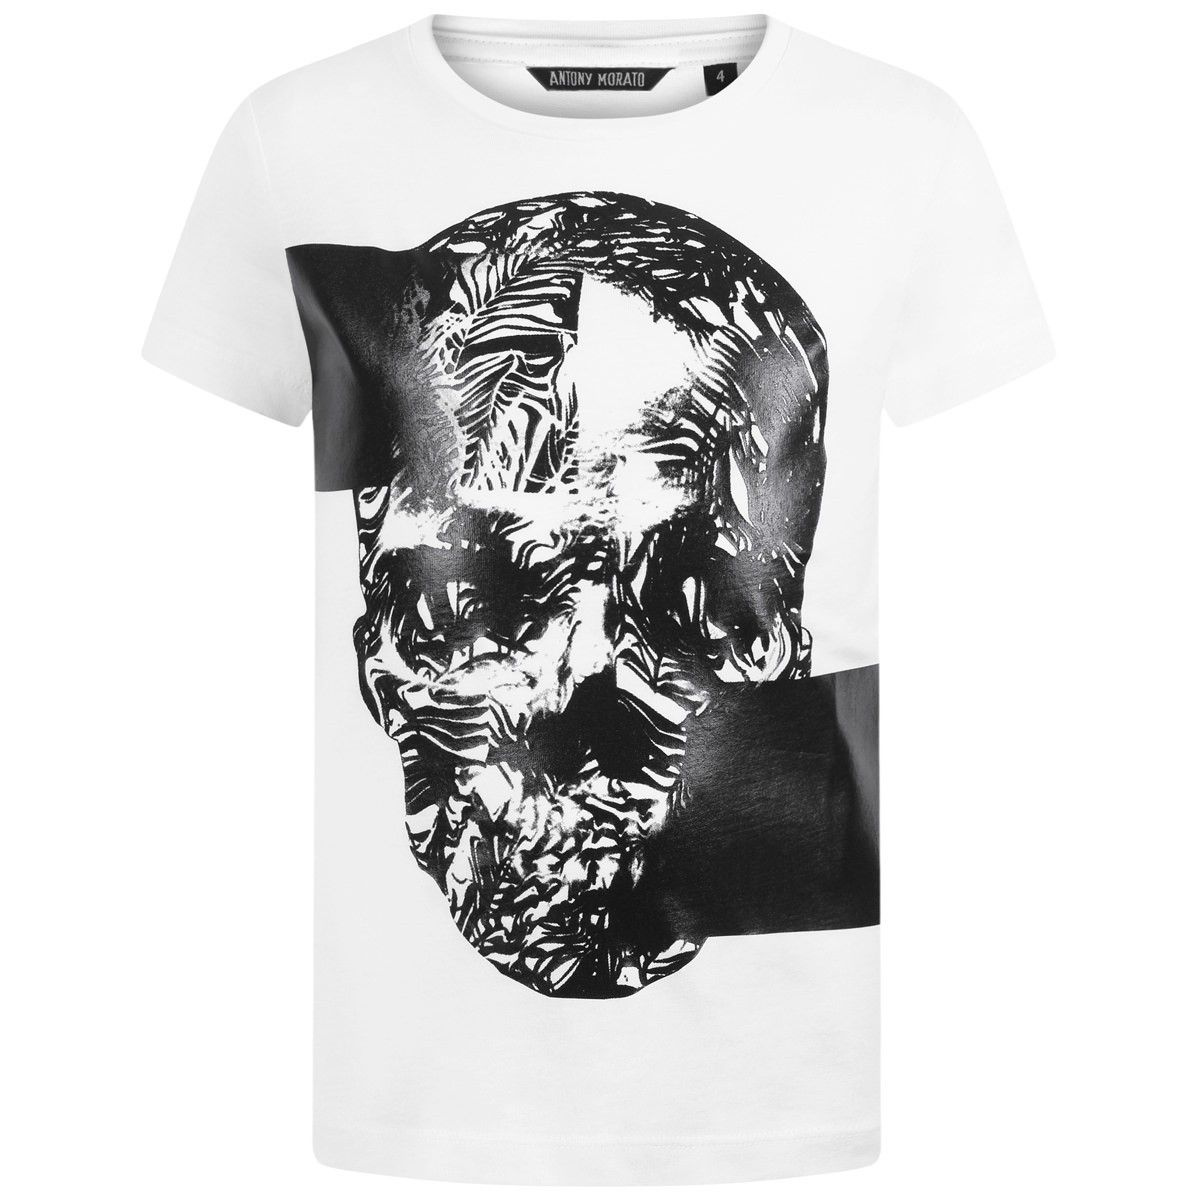 5aff4942 Antony Morato Boys White Skull Print Top | Antony Morato SS16 | Boys ...